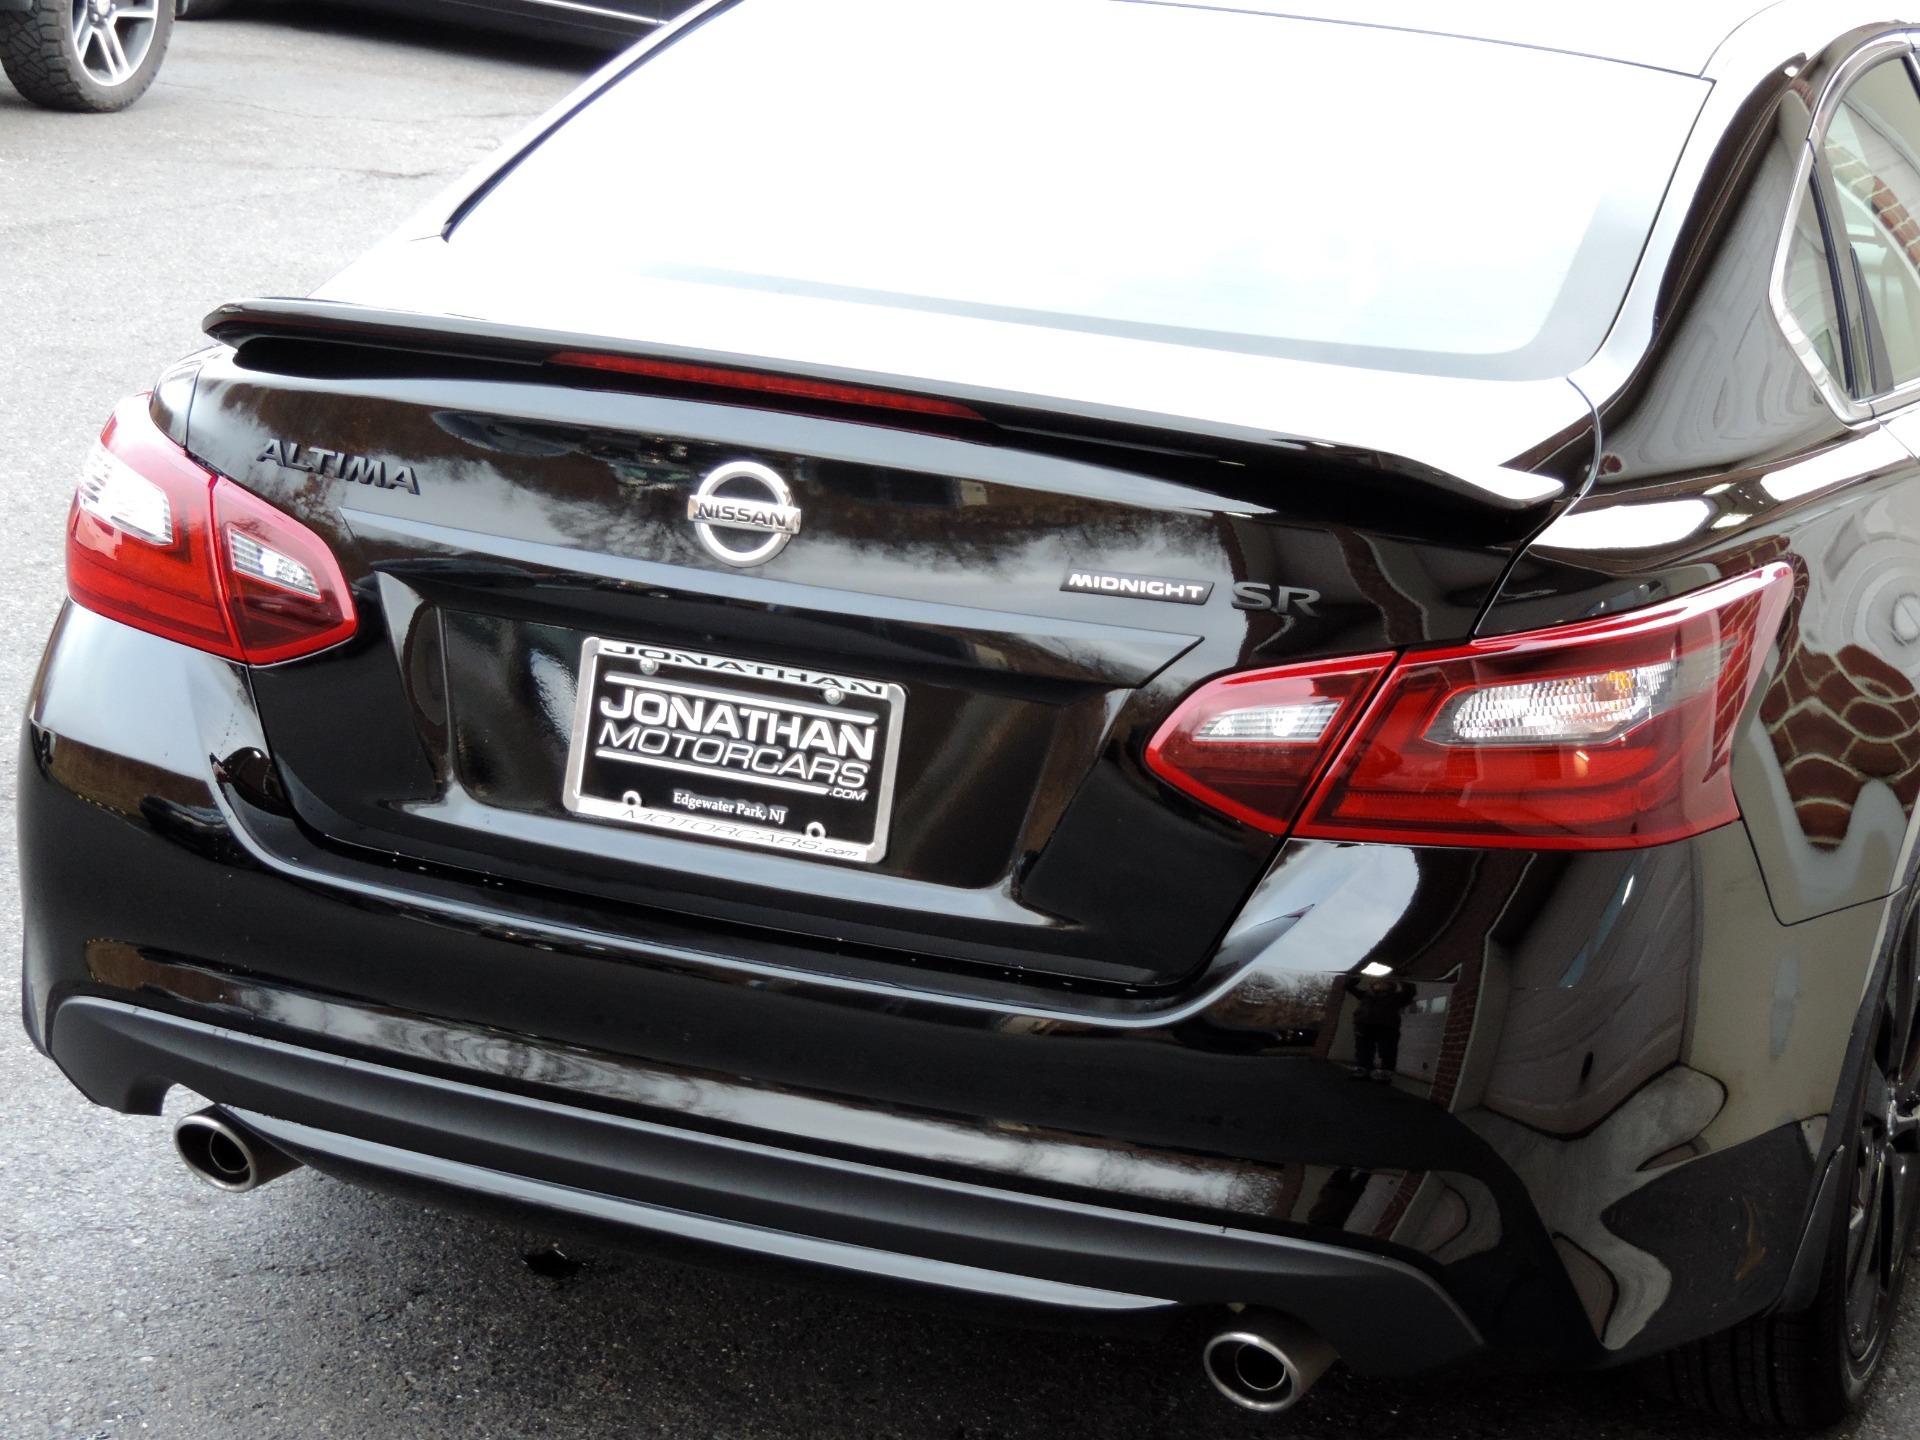 Used-2018-Nissan-Altima-25-SR-Midnight-Edition